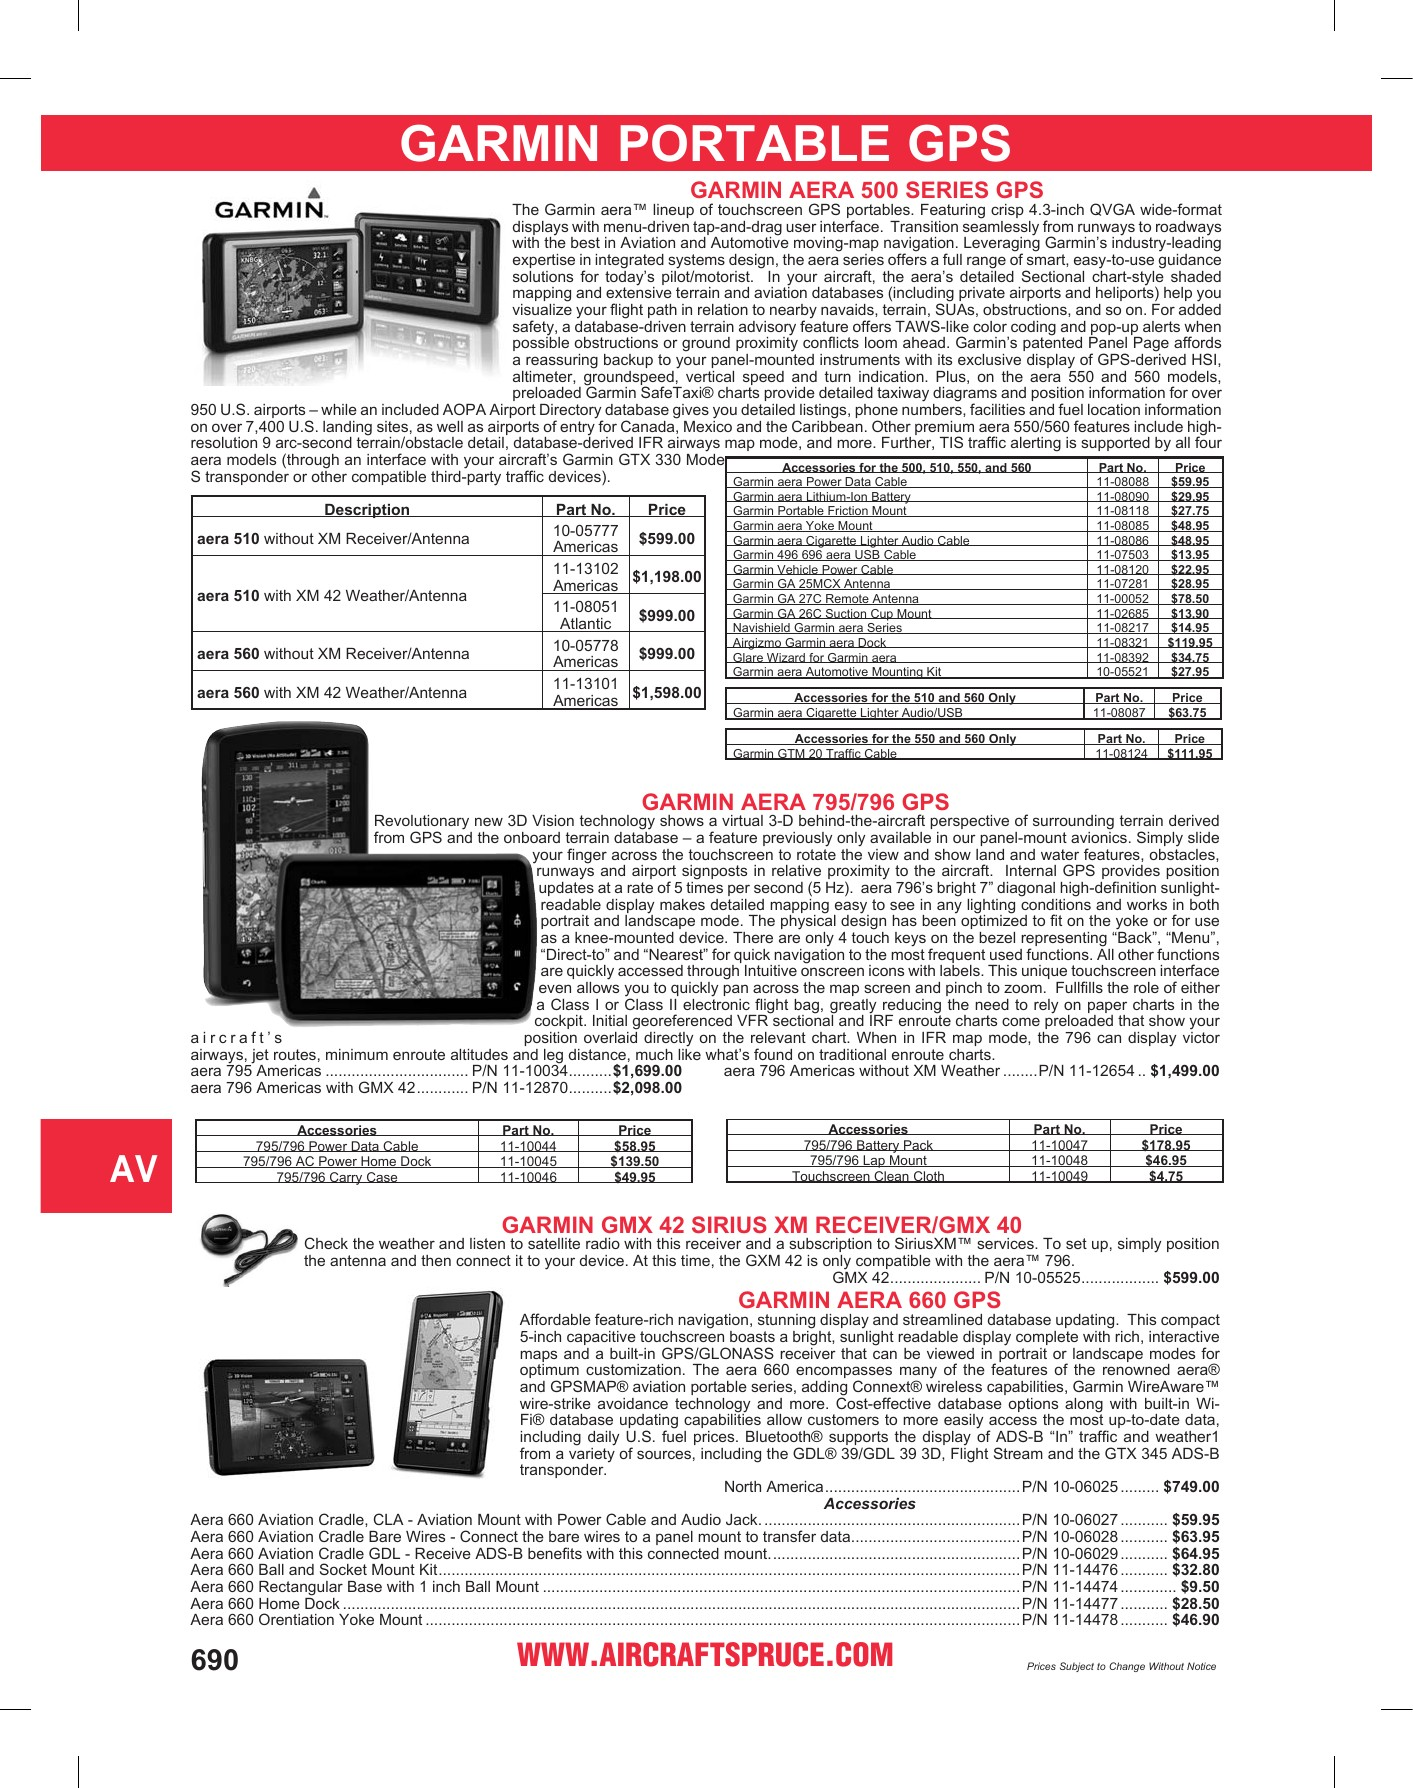 Modifying Gentex 177 Wiring Garmin Portable Gps Of Modifying Gentex 177 Wiring